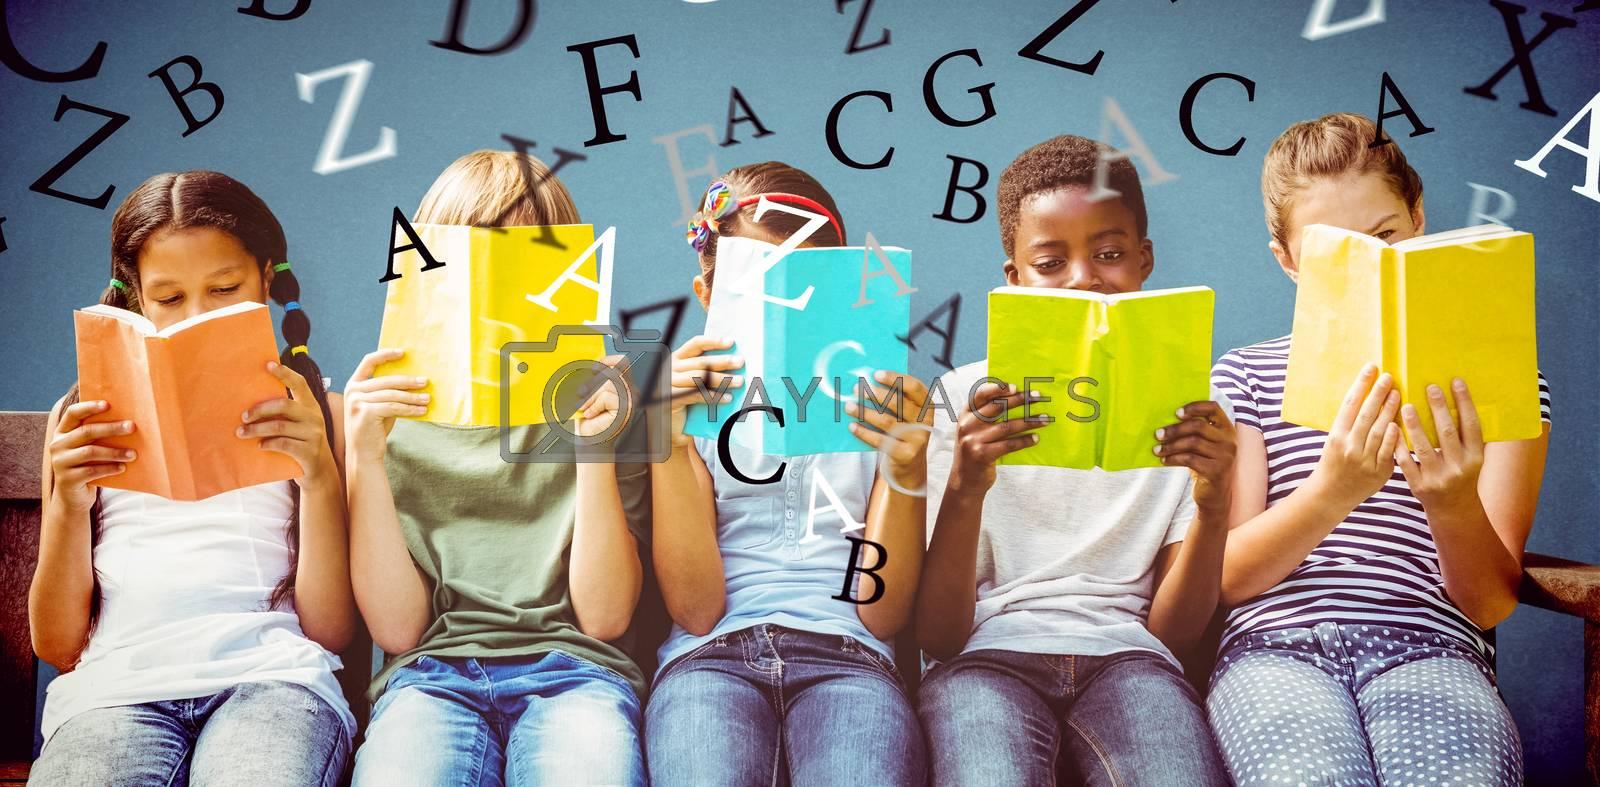 Children reading books at park against blue background